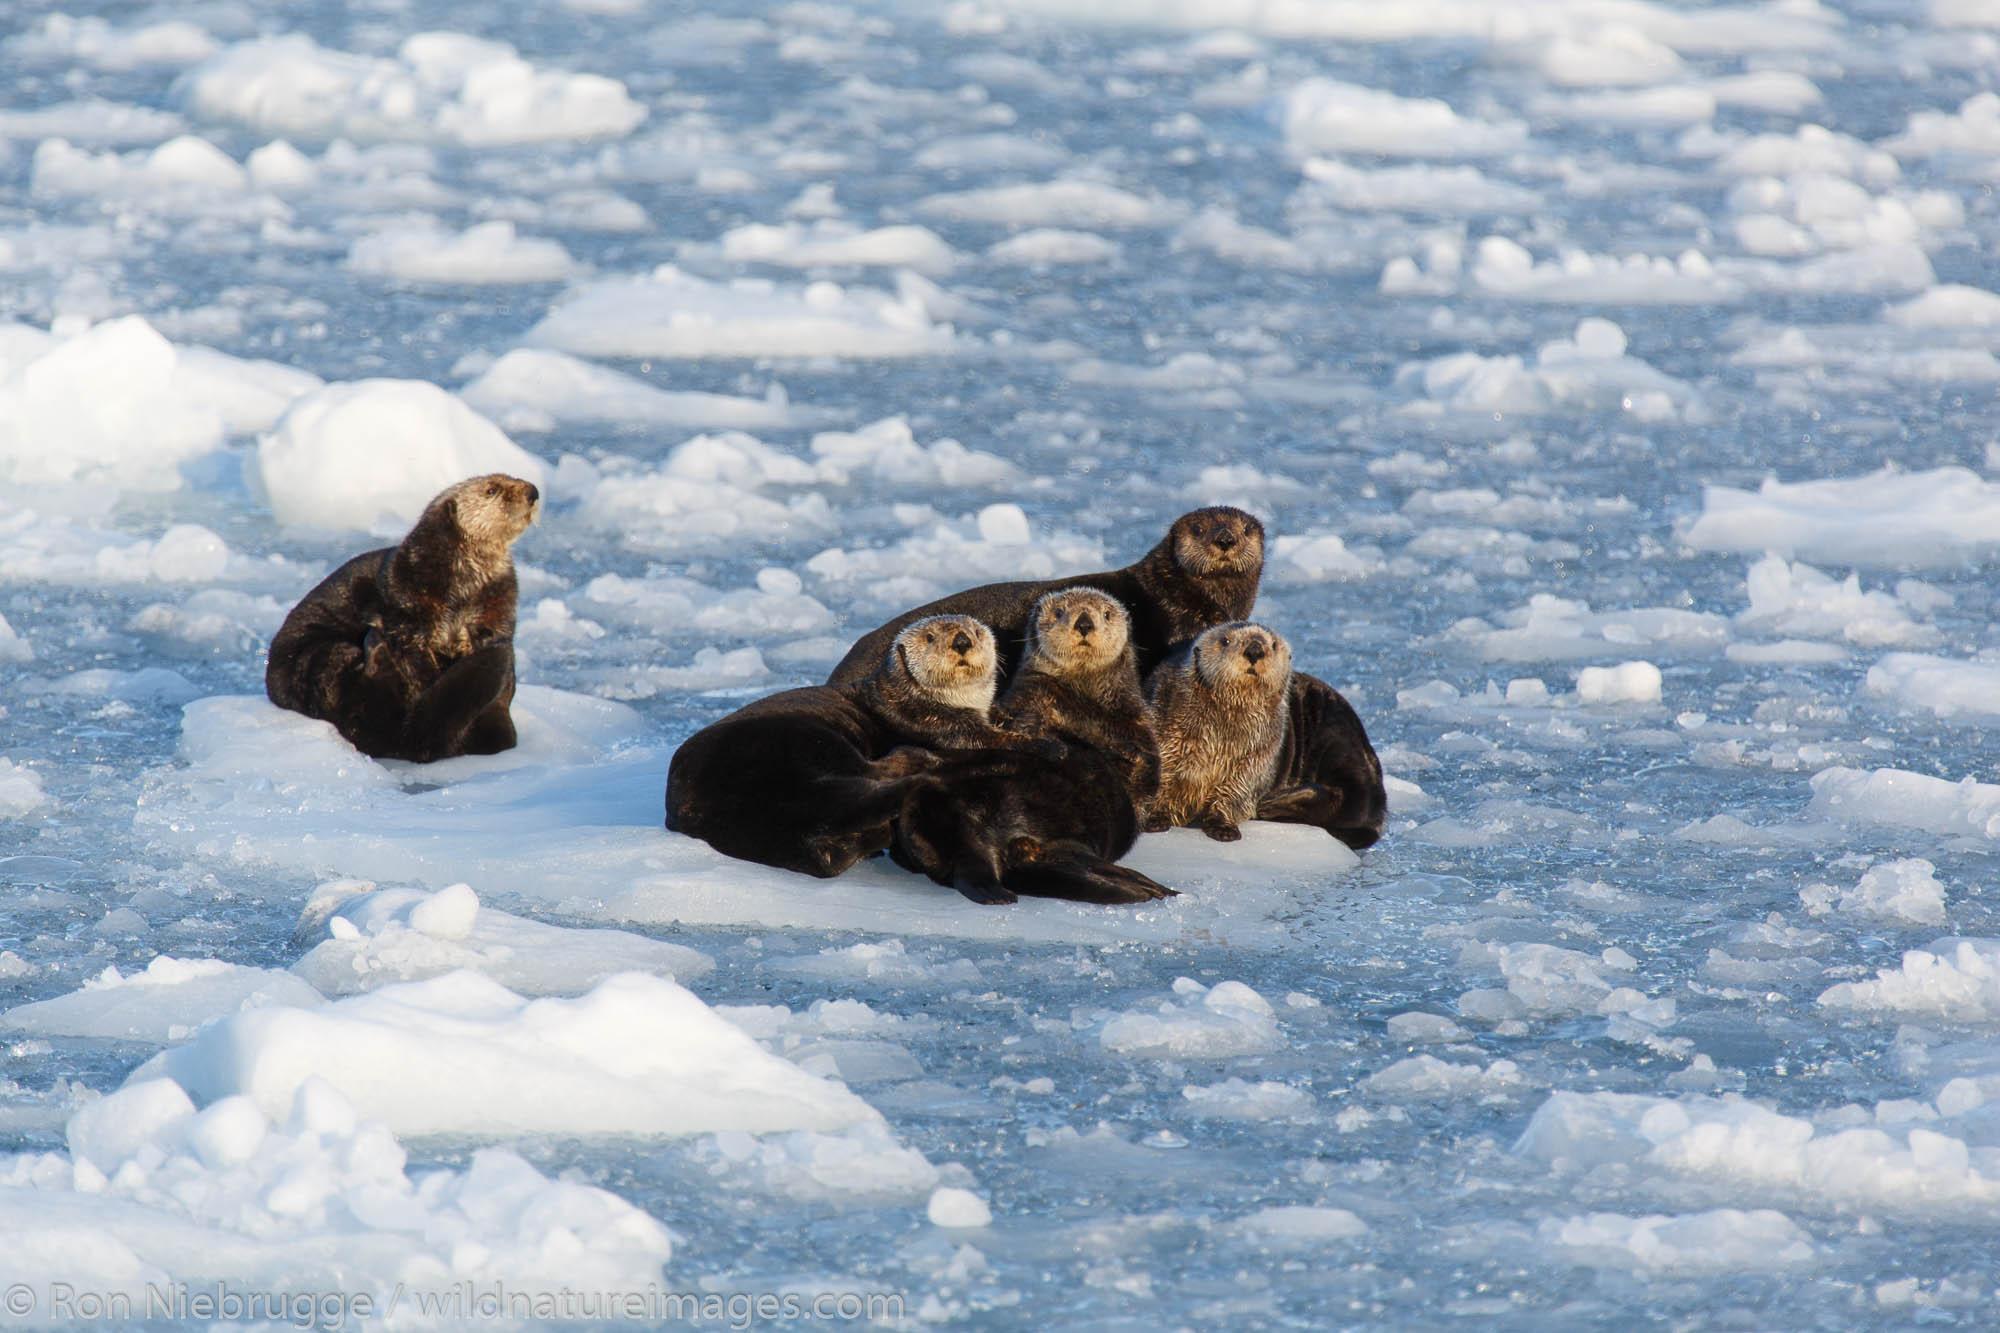 Sea Otters, Harriman Fjord, Prince William Sound, Chugach National Forest, Alaska.